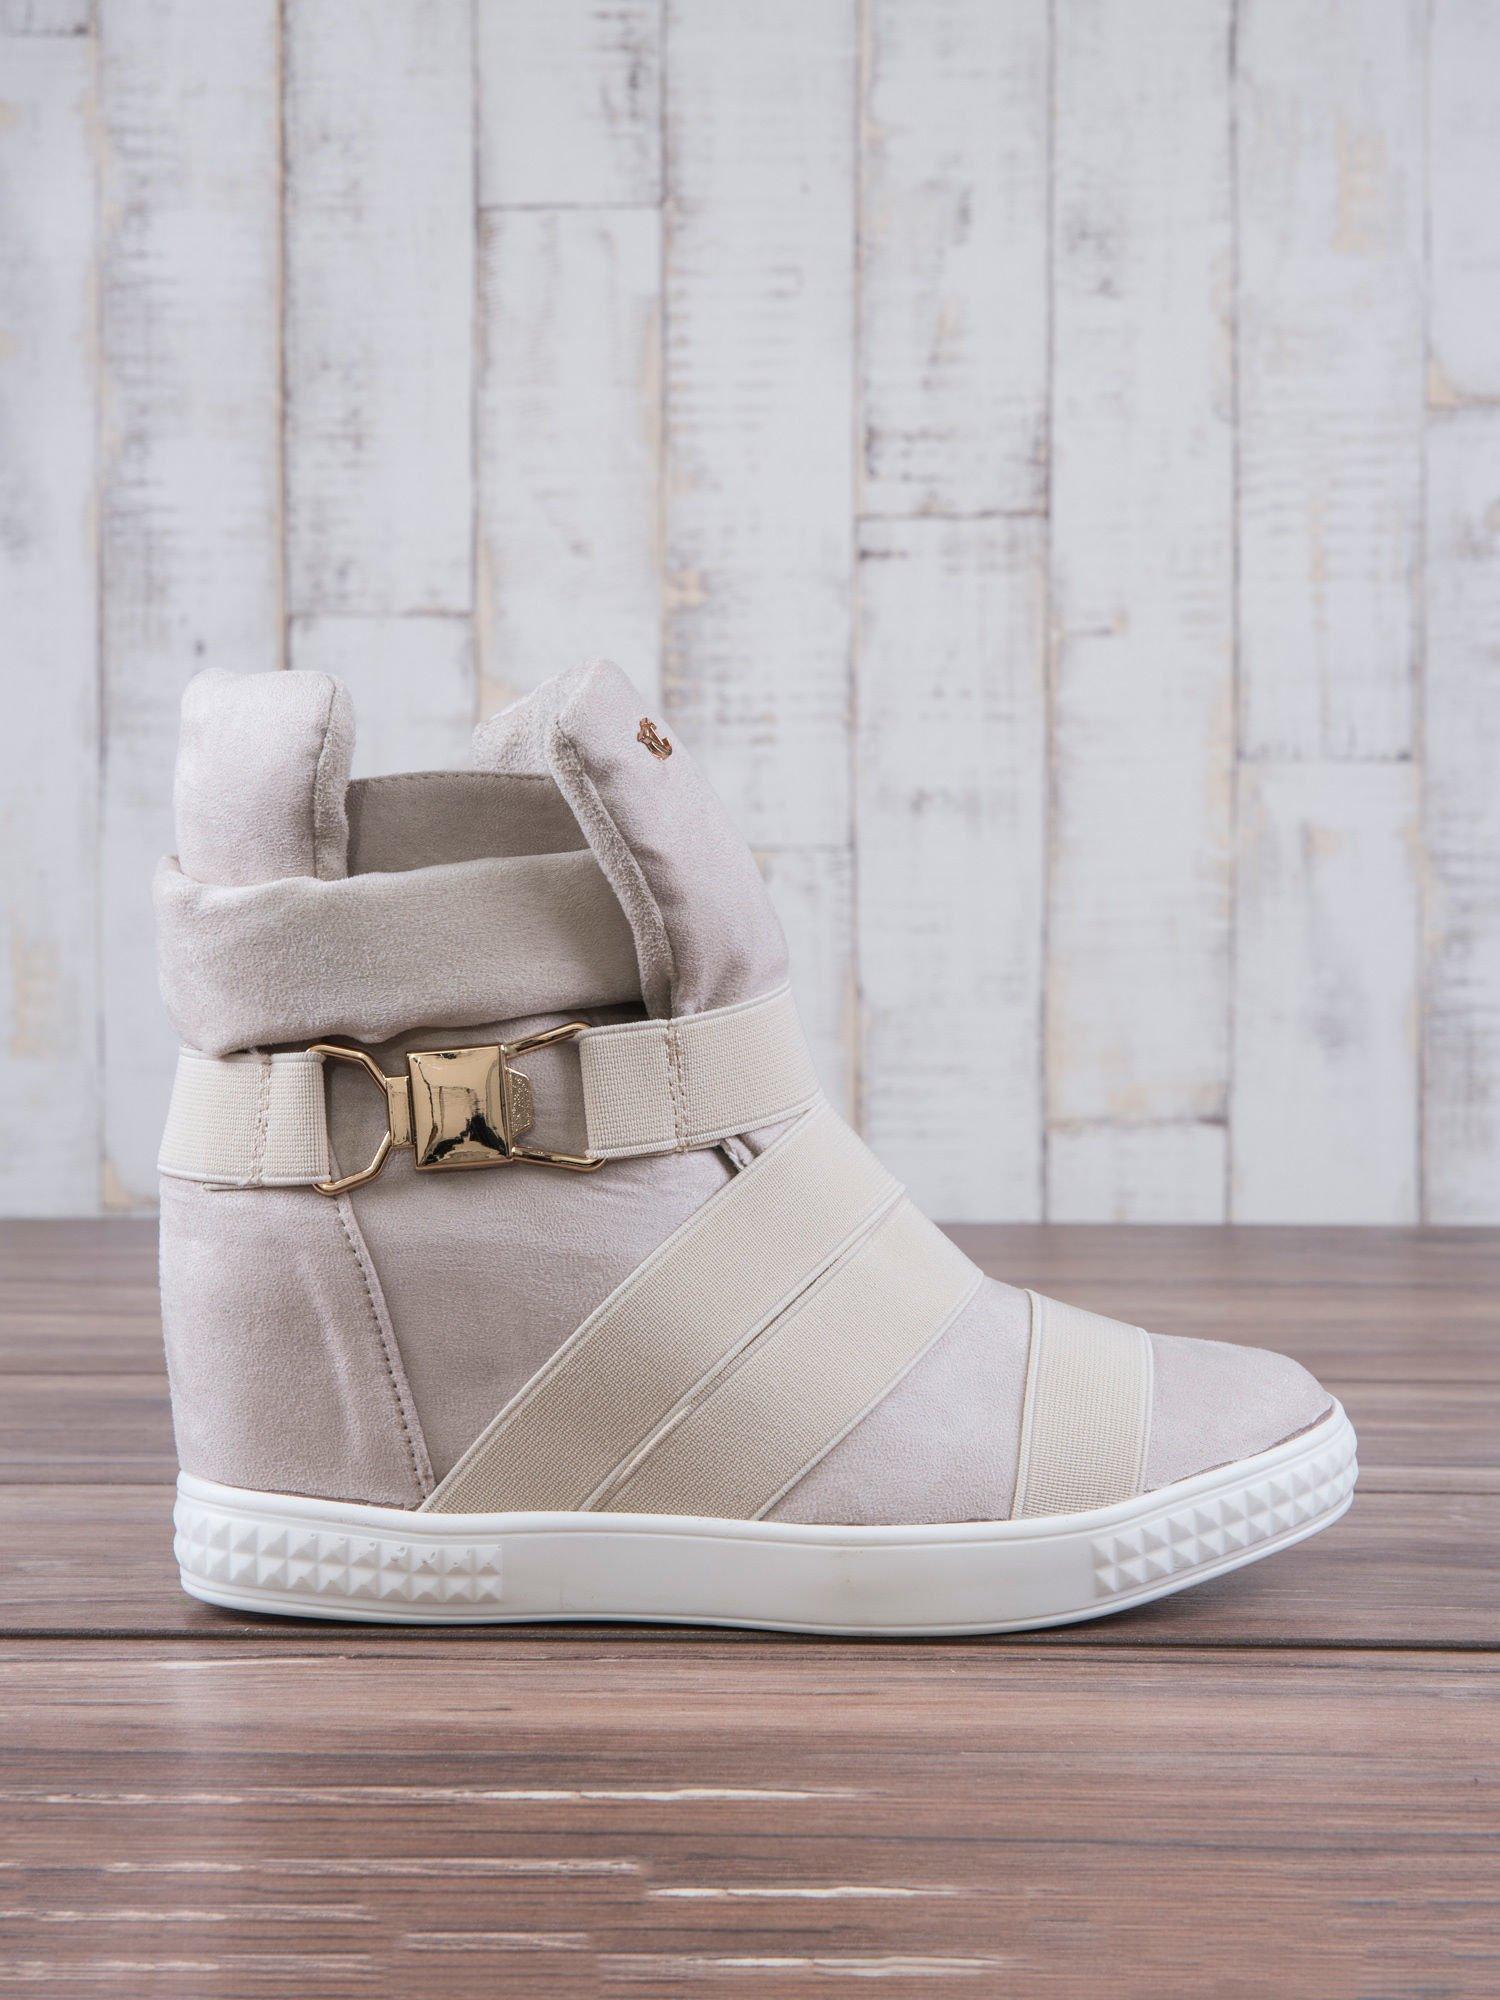 Beżowe zamszowe sneakersy bandage z klamerką Lucky                                  zdj.                                  2